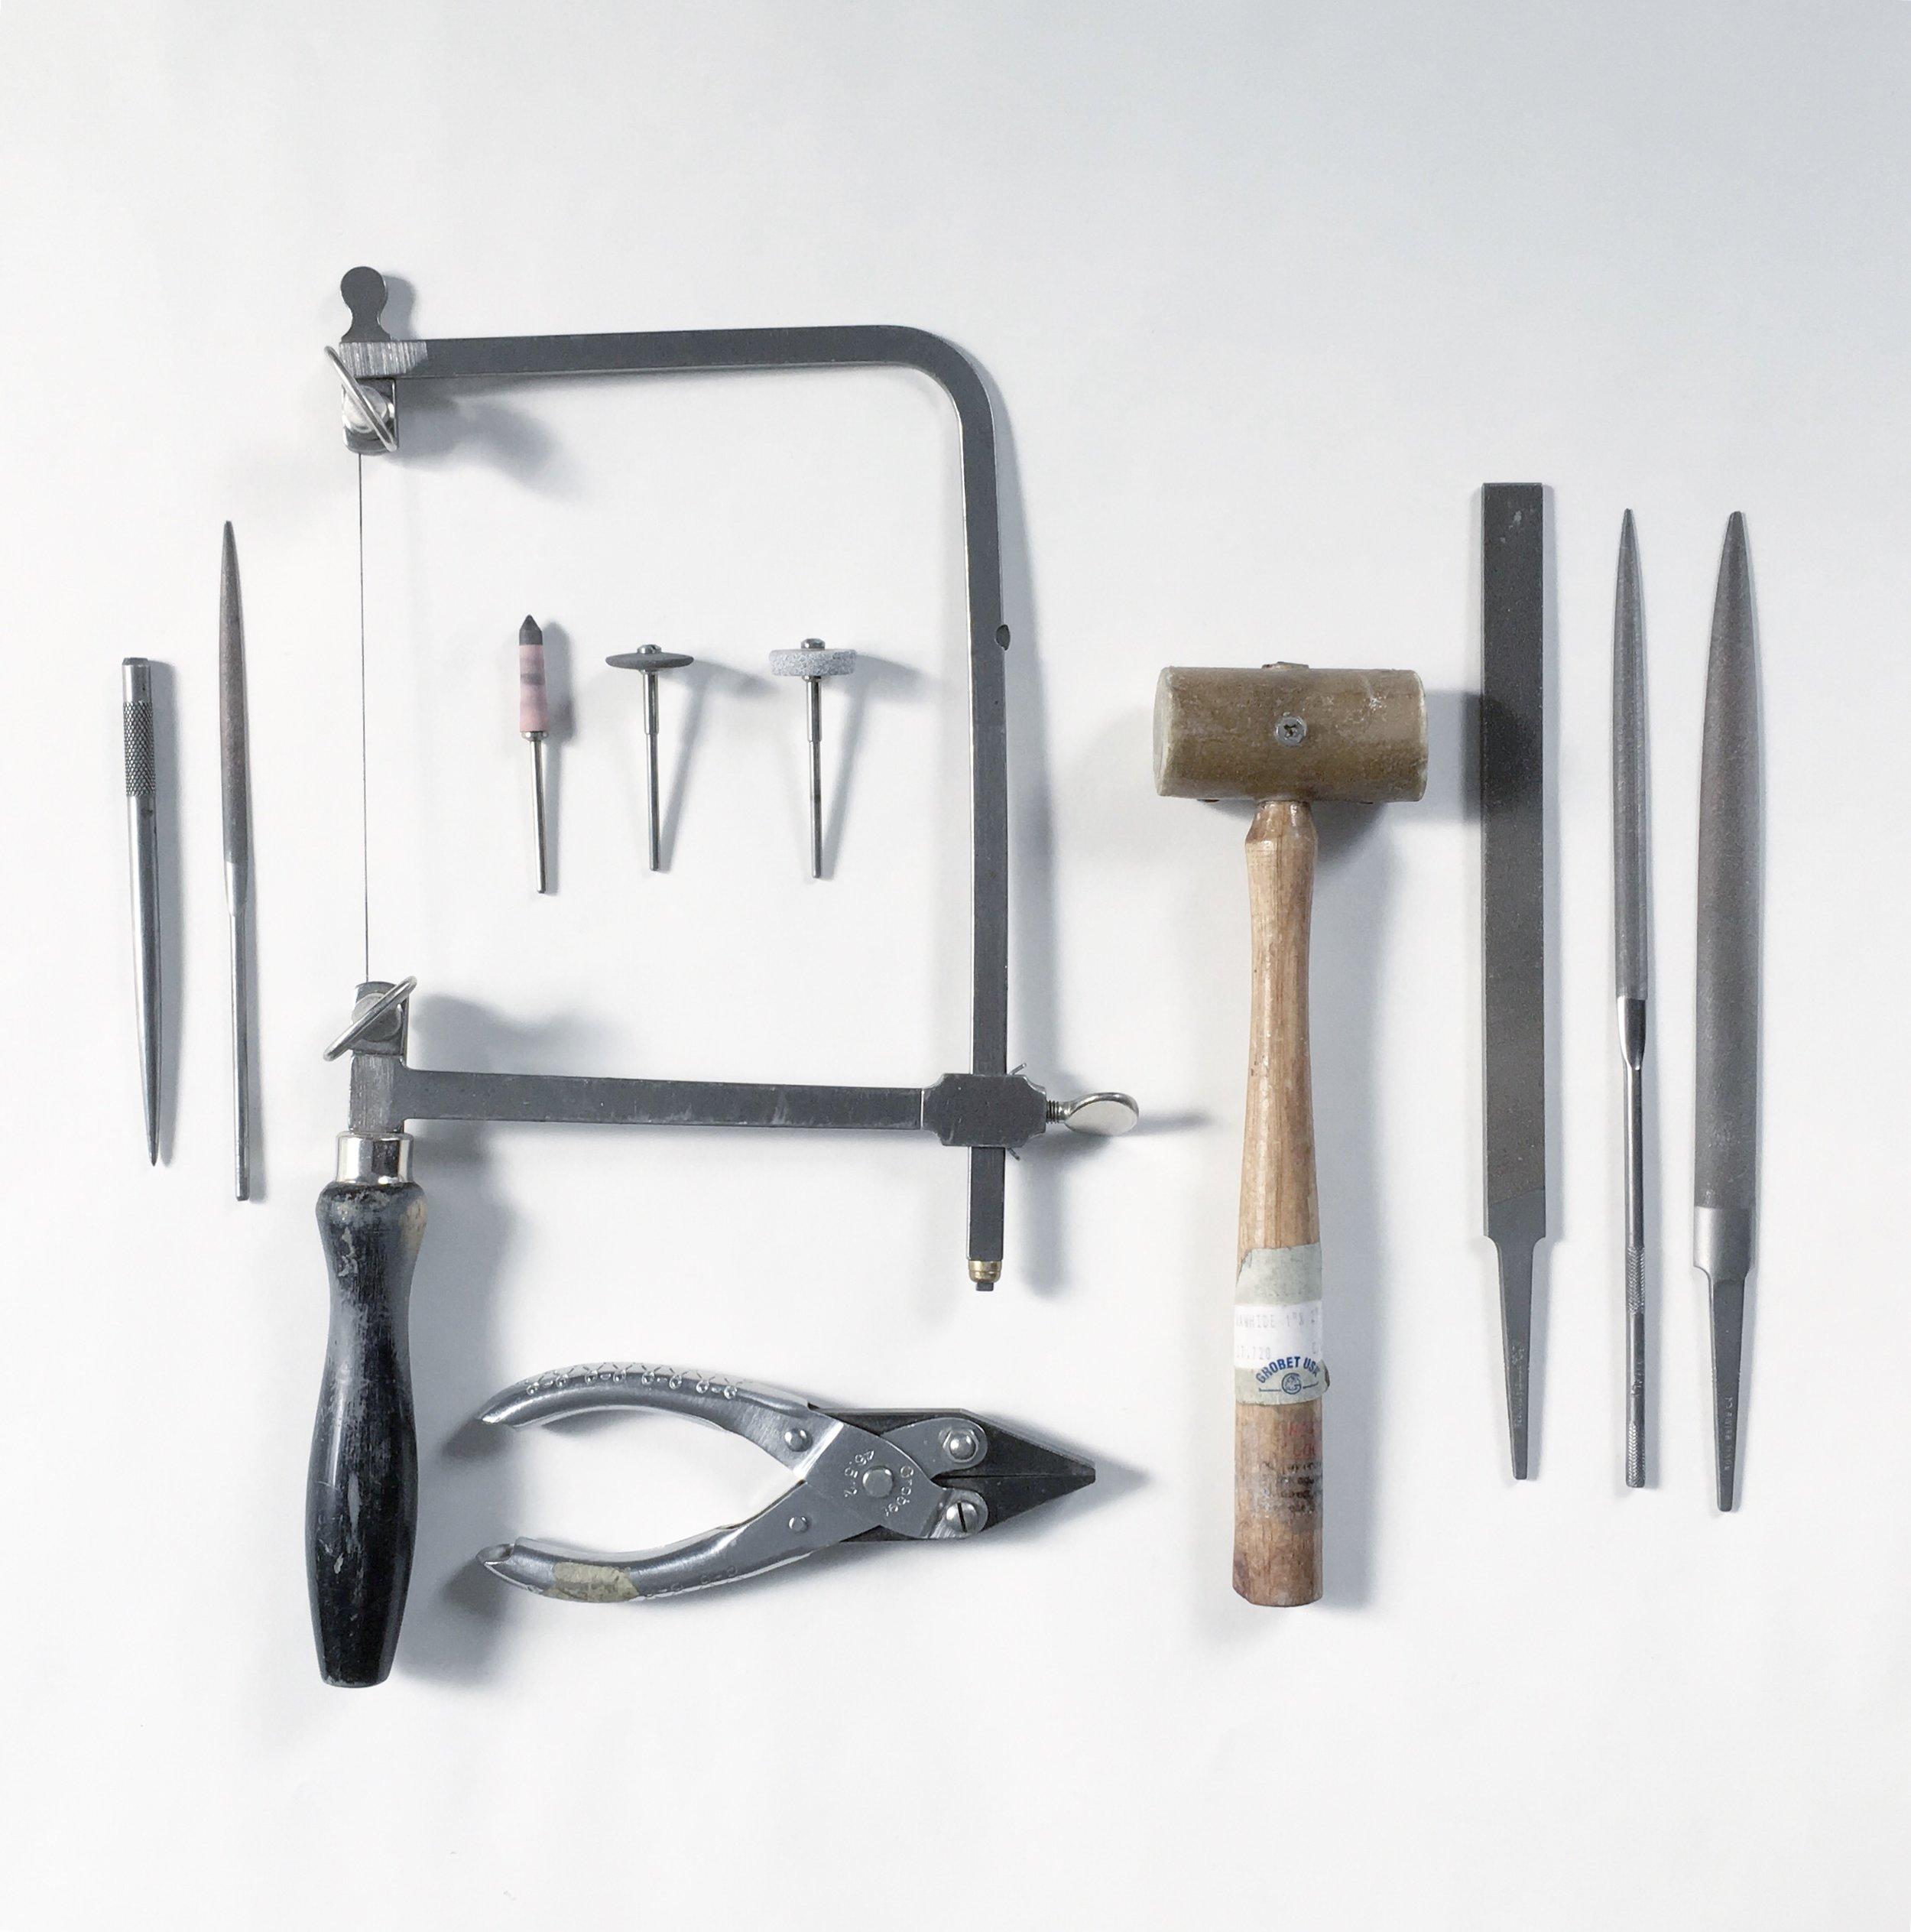 Jewellery tools